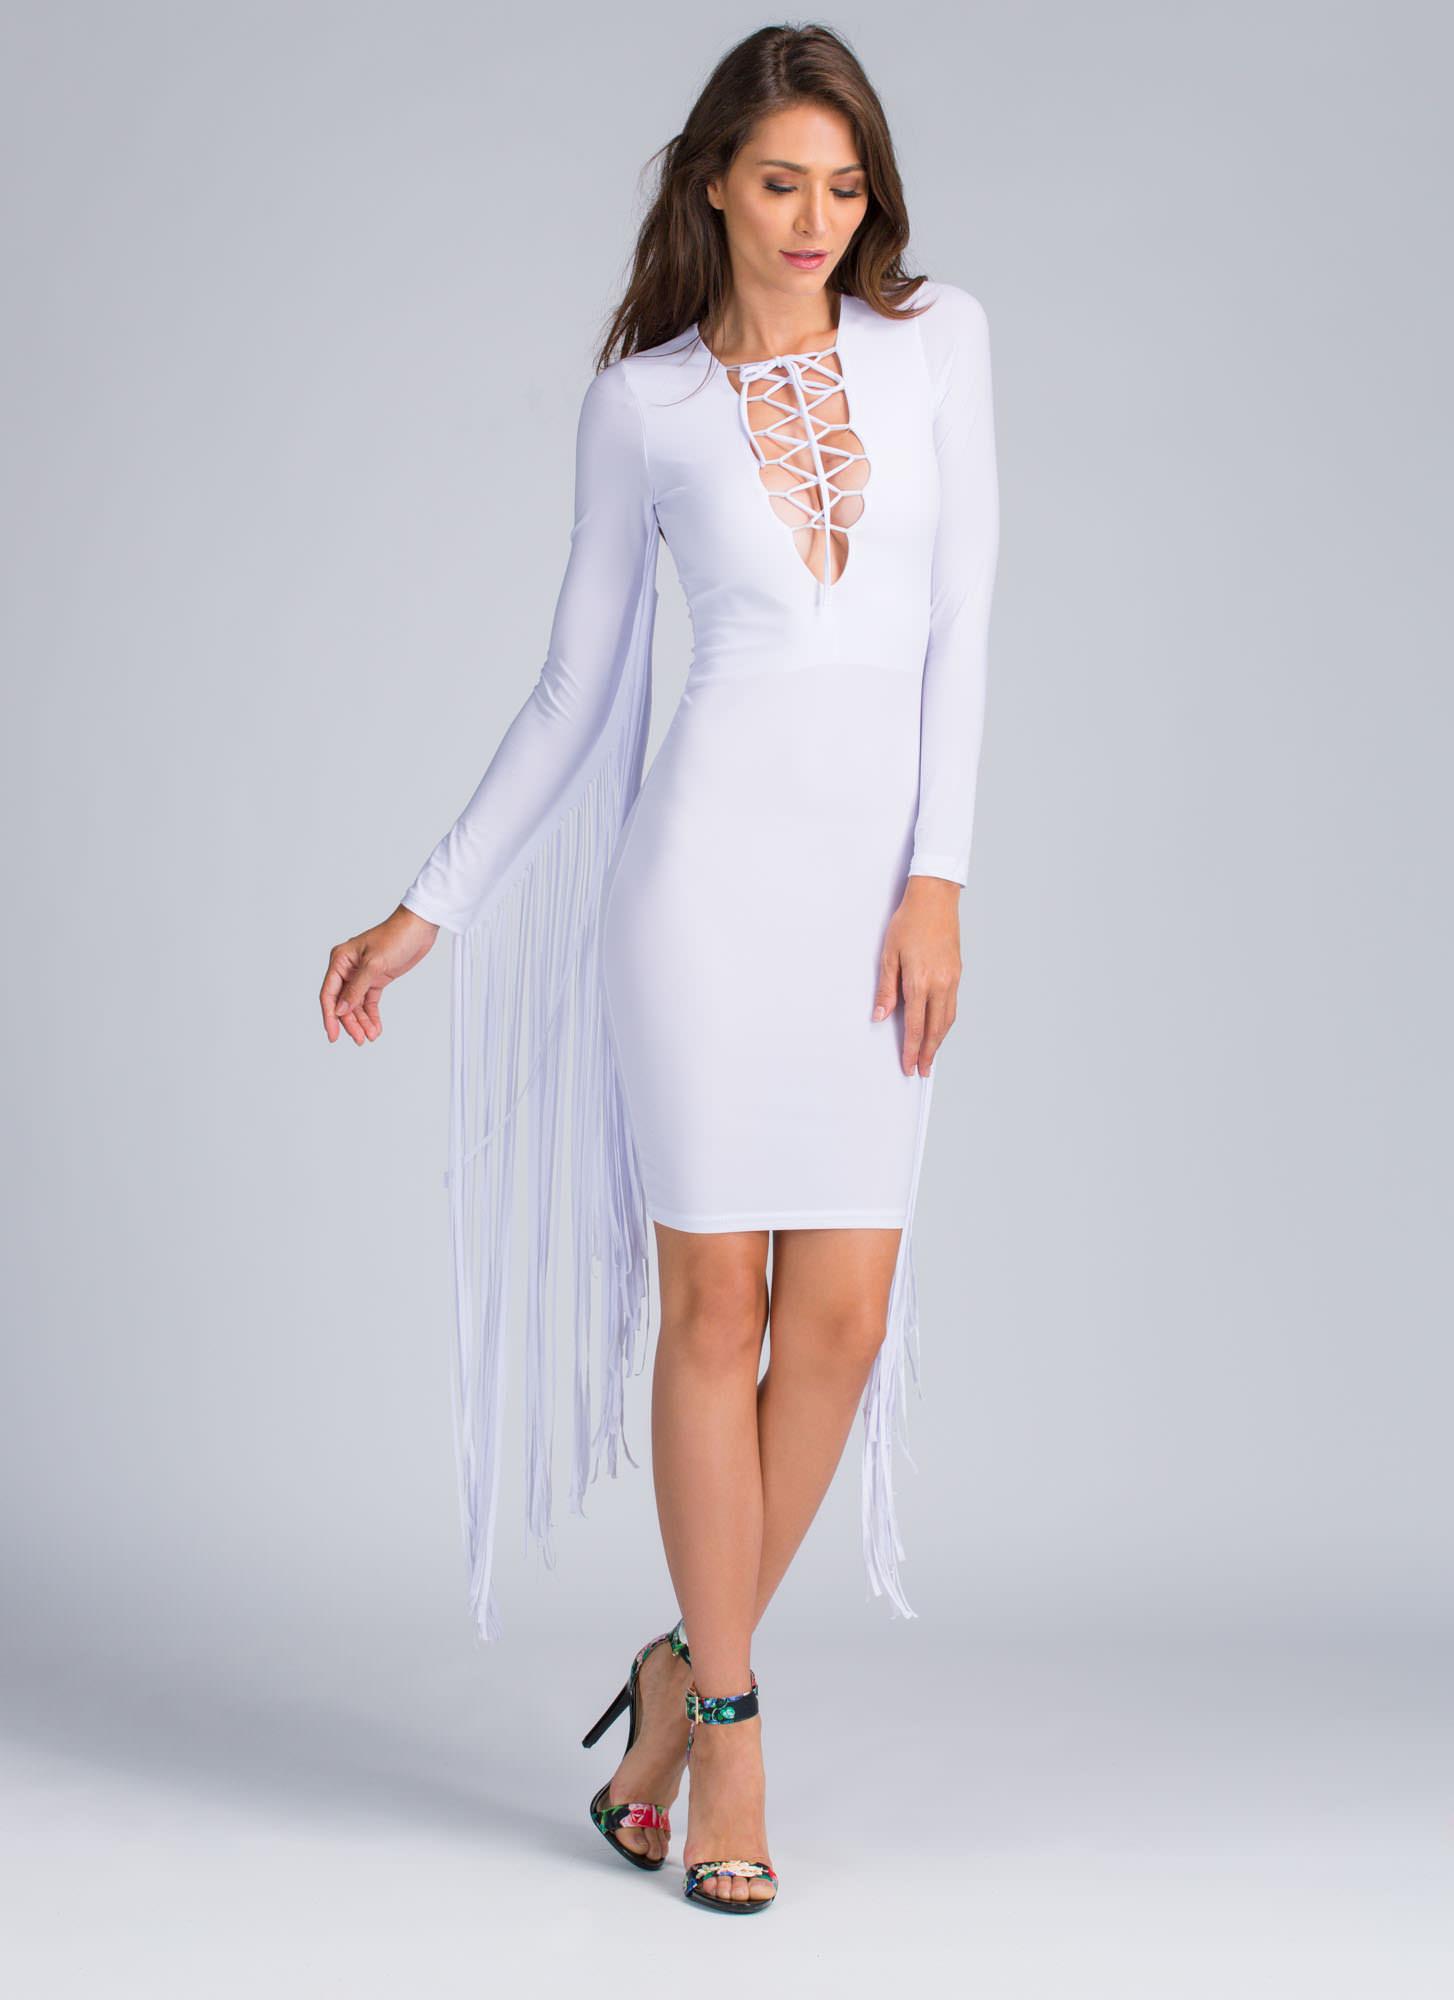 Rock Lace-Up Fringe Midi Dress WHITE BLACK - GoJane.com